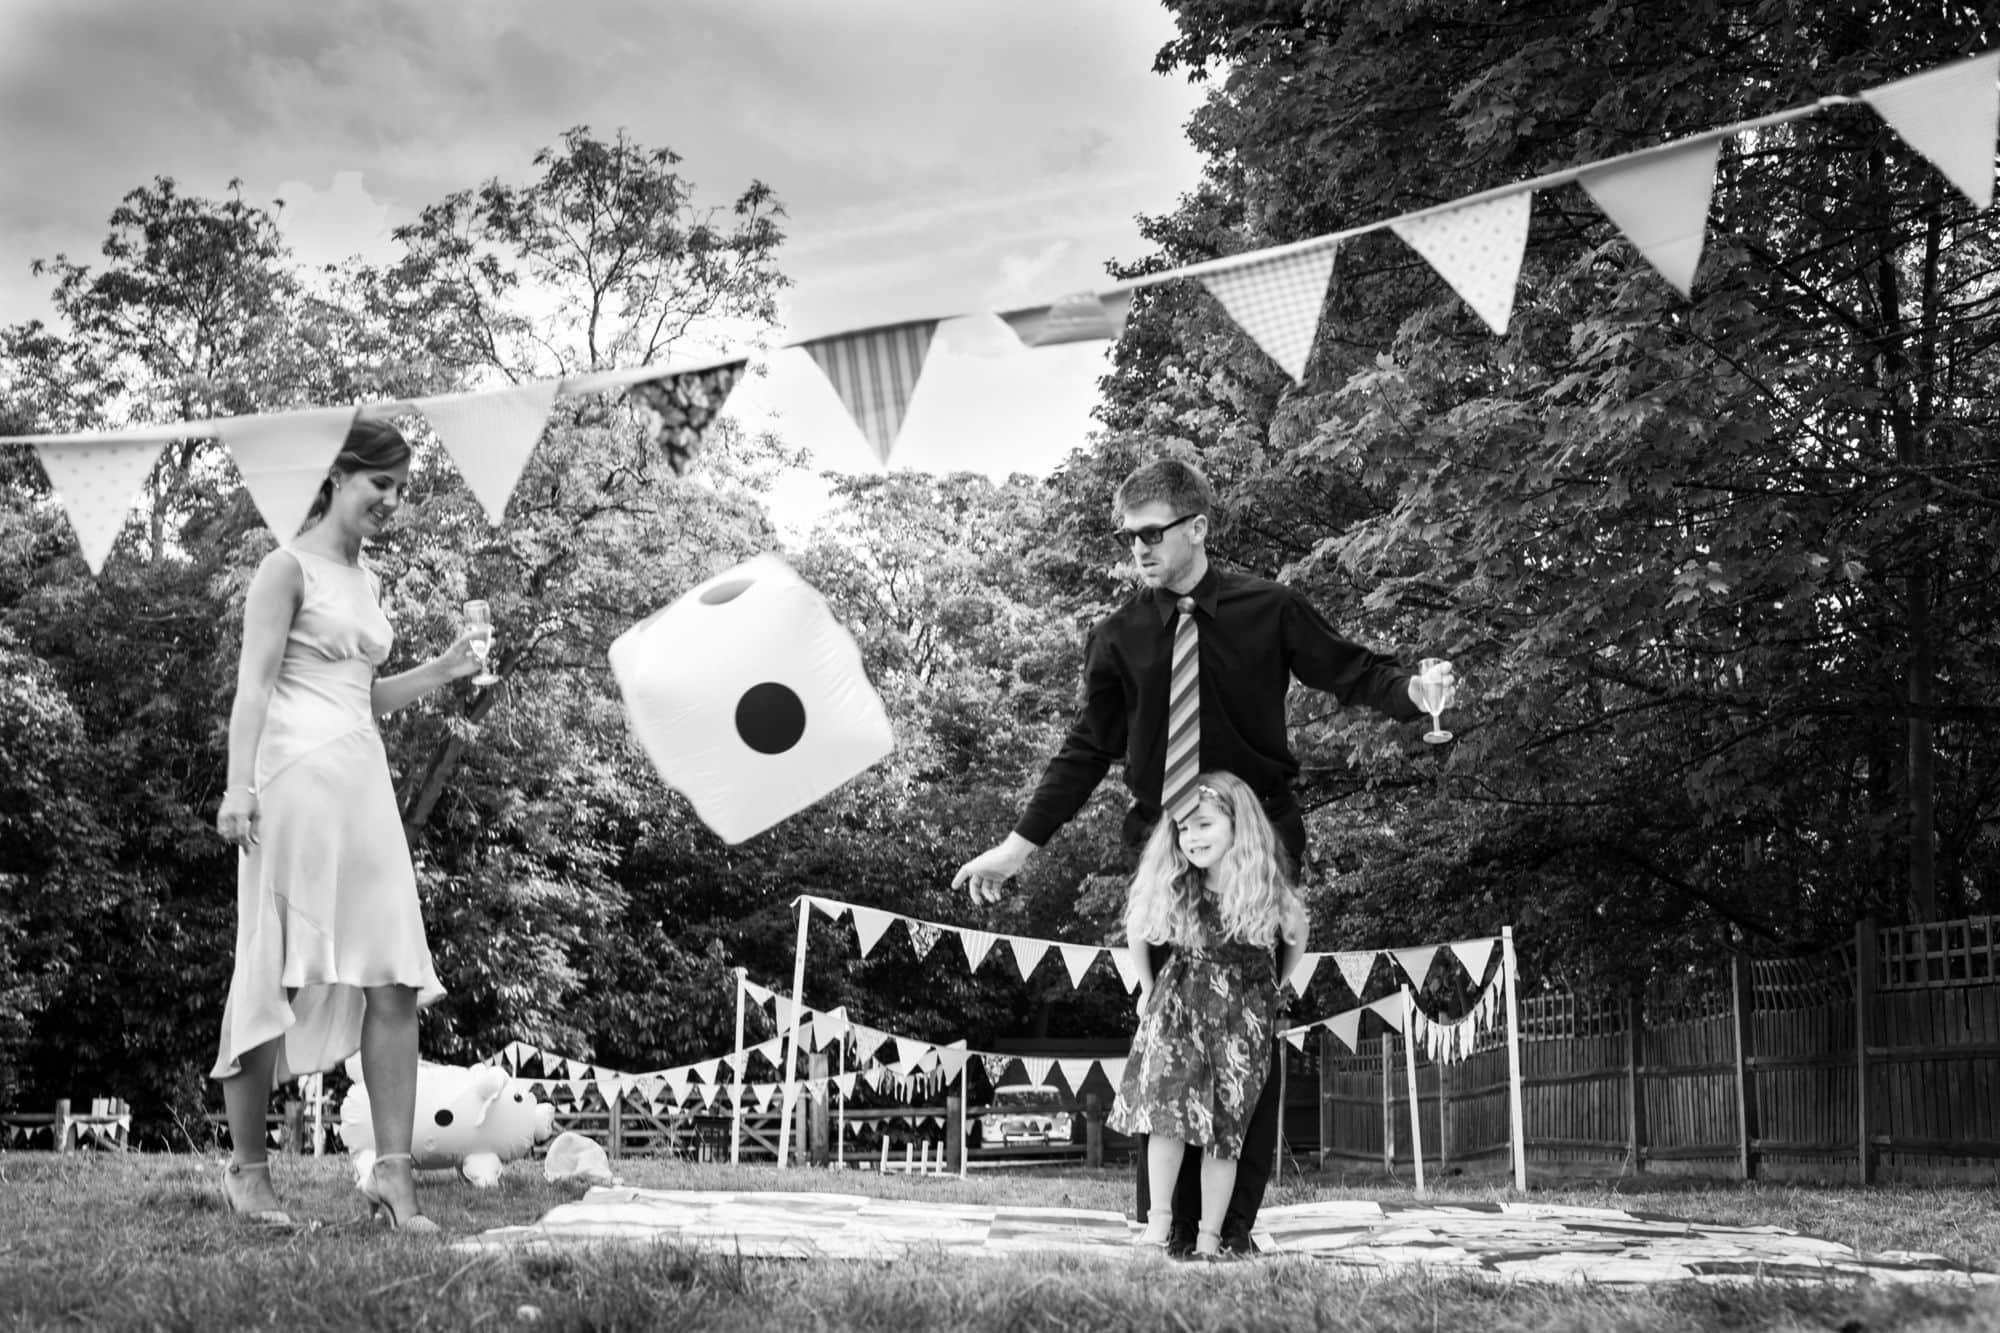 Mark-Seymour-Wedding-Photographer-UK-28 19